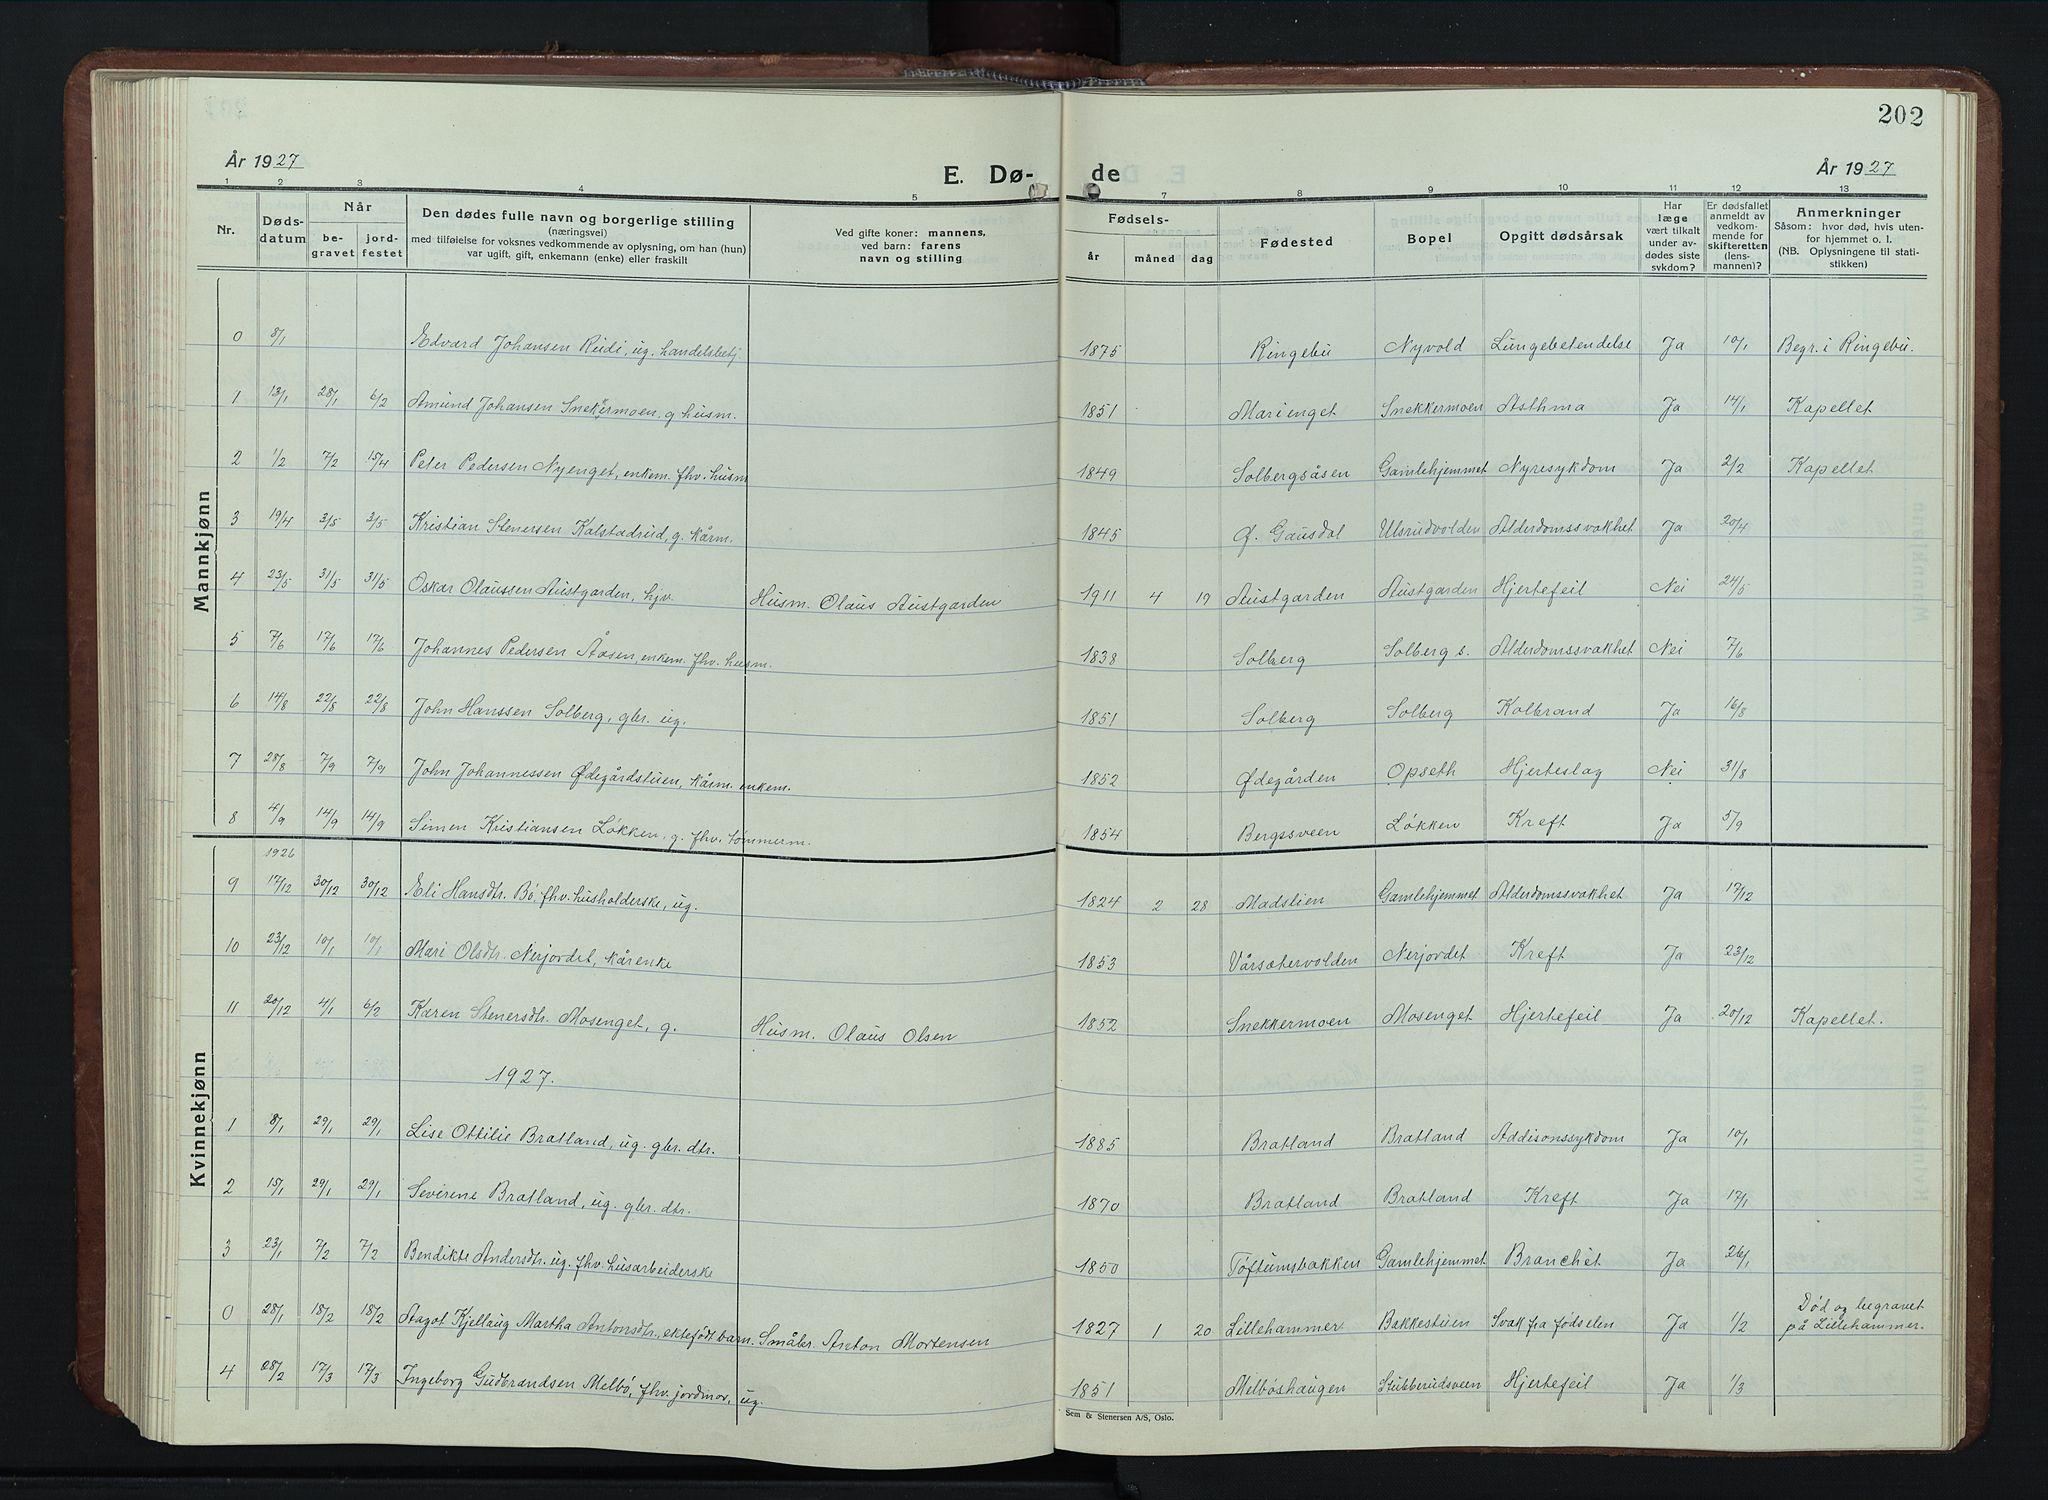 SAH, Vestre Gausdal prestekontor, Klokkerbok nr. 5, 1926-1955, s. 202